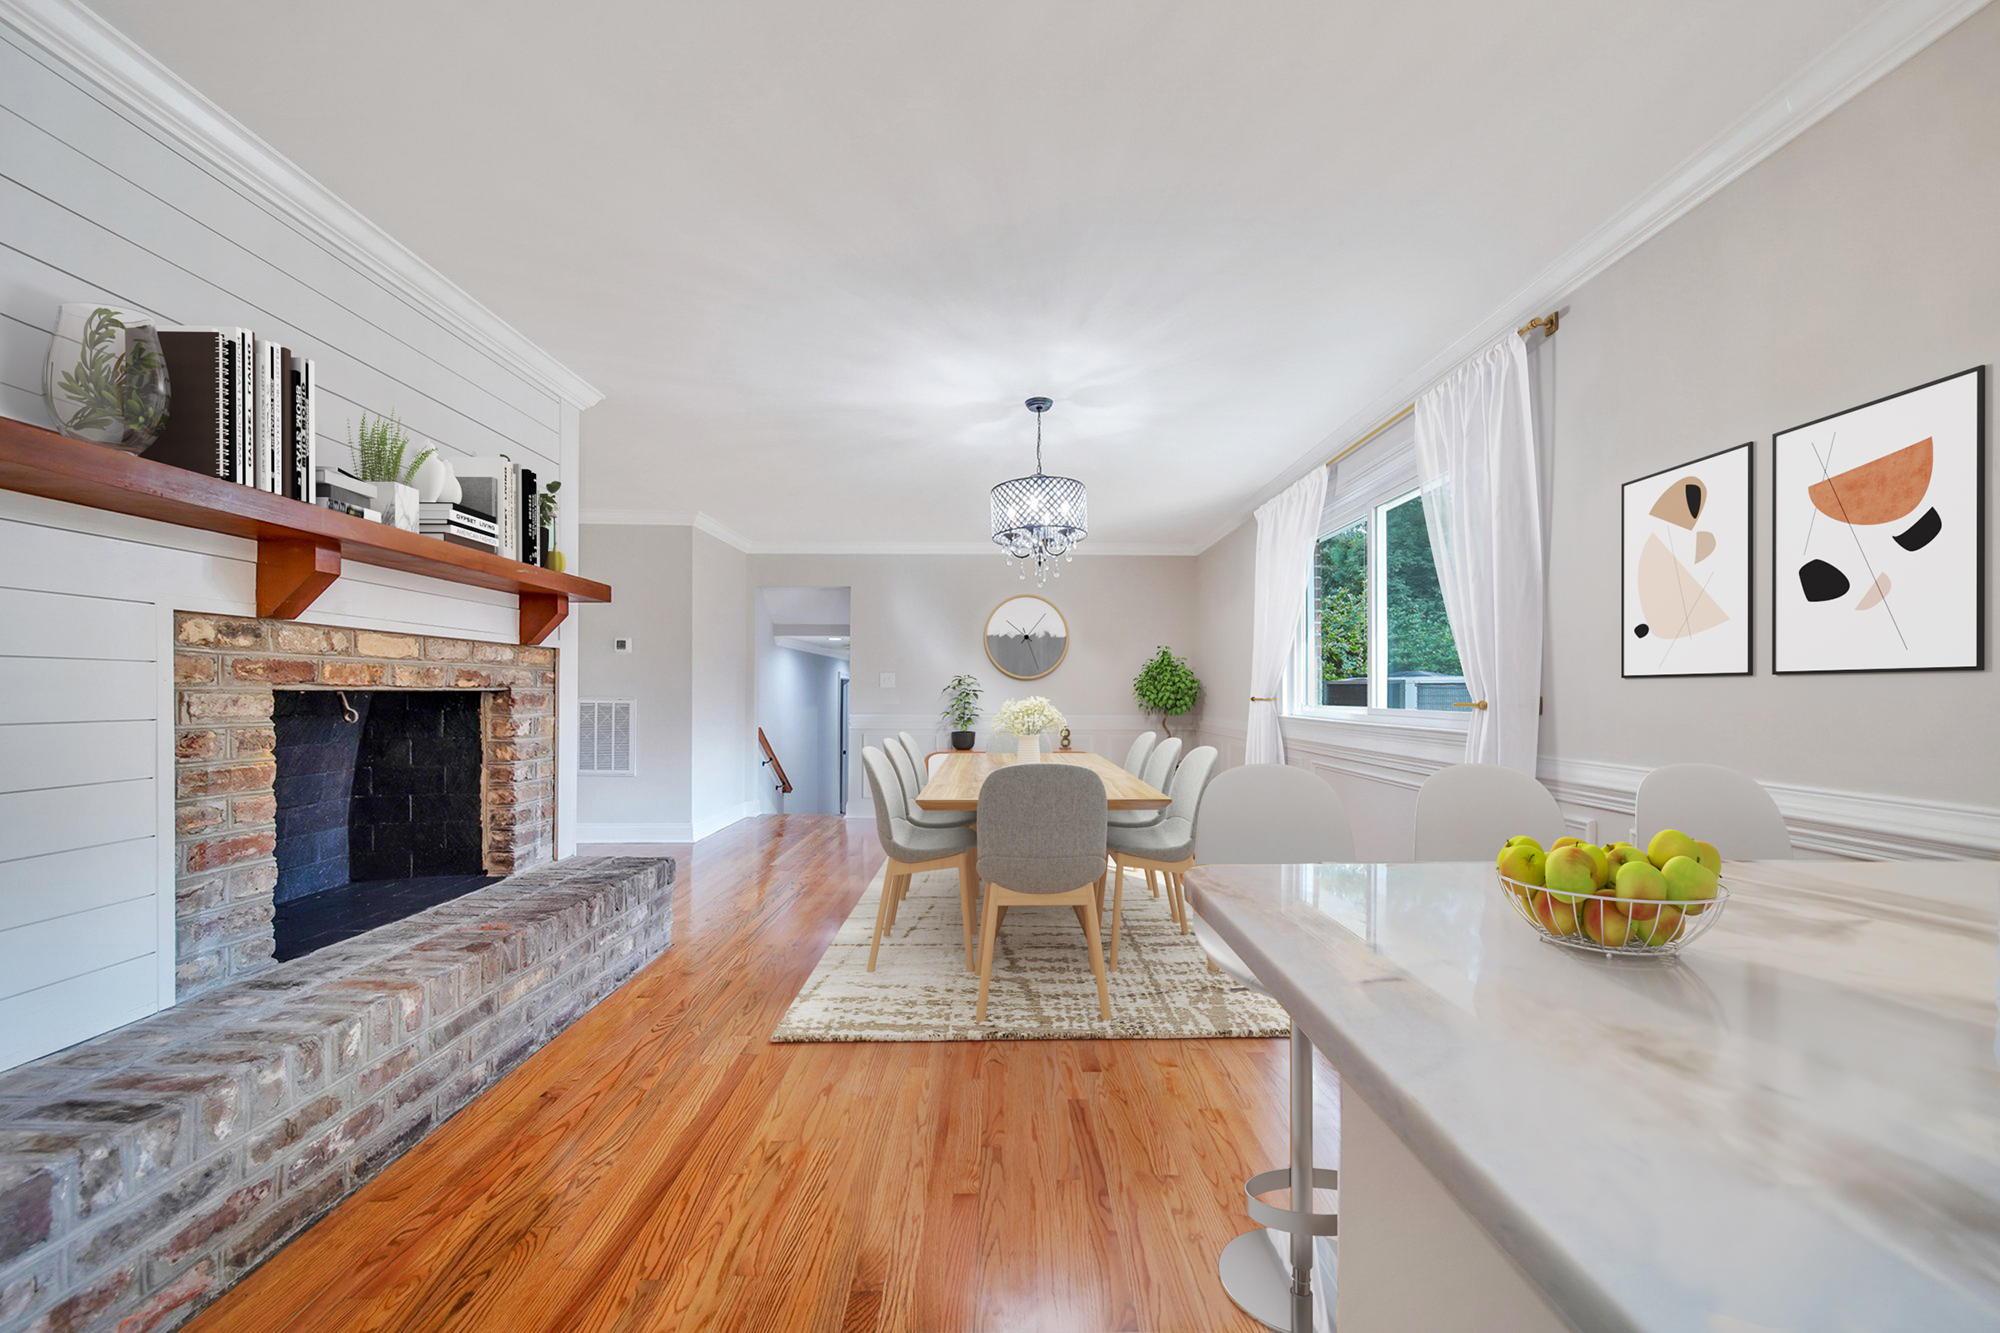 Country Club II Homes For Sale - 1477 Burningtree, Charleston, SC - 6